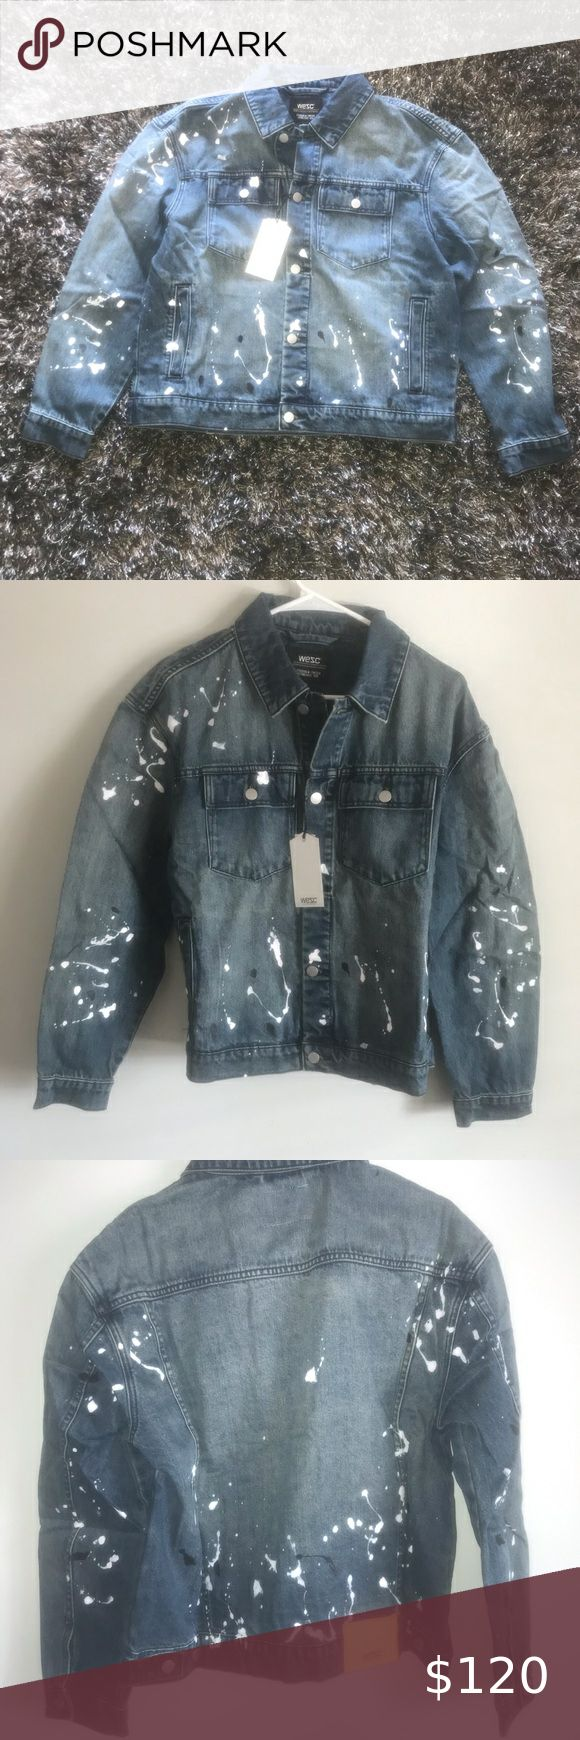 Wesc Paint Splatter Denim Jacket Mens Small Nwt Wesc Paint Splatter Denim Jacket Mens Size Small Brand New Wit Denim Jacket Men Denim Jacket Clothes Design [ 1740 x 580 Pixel ]